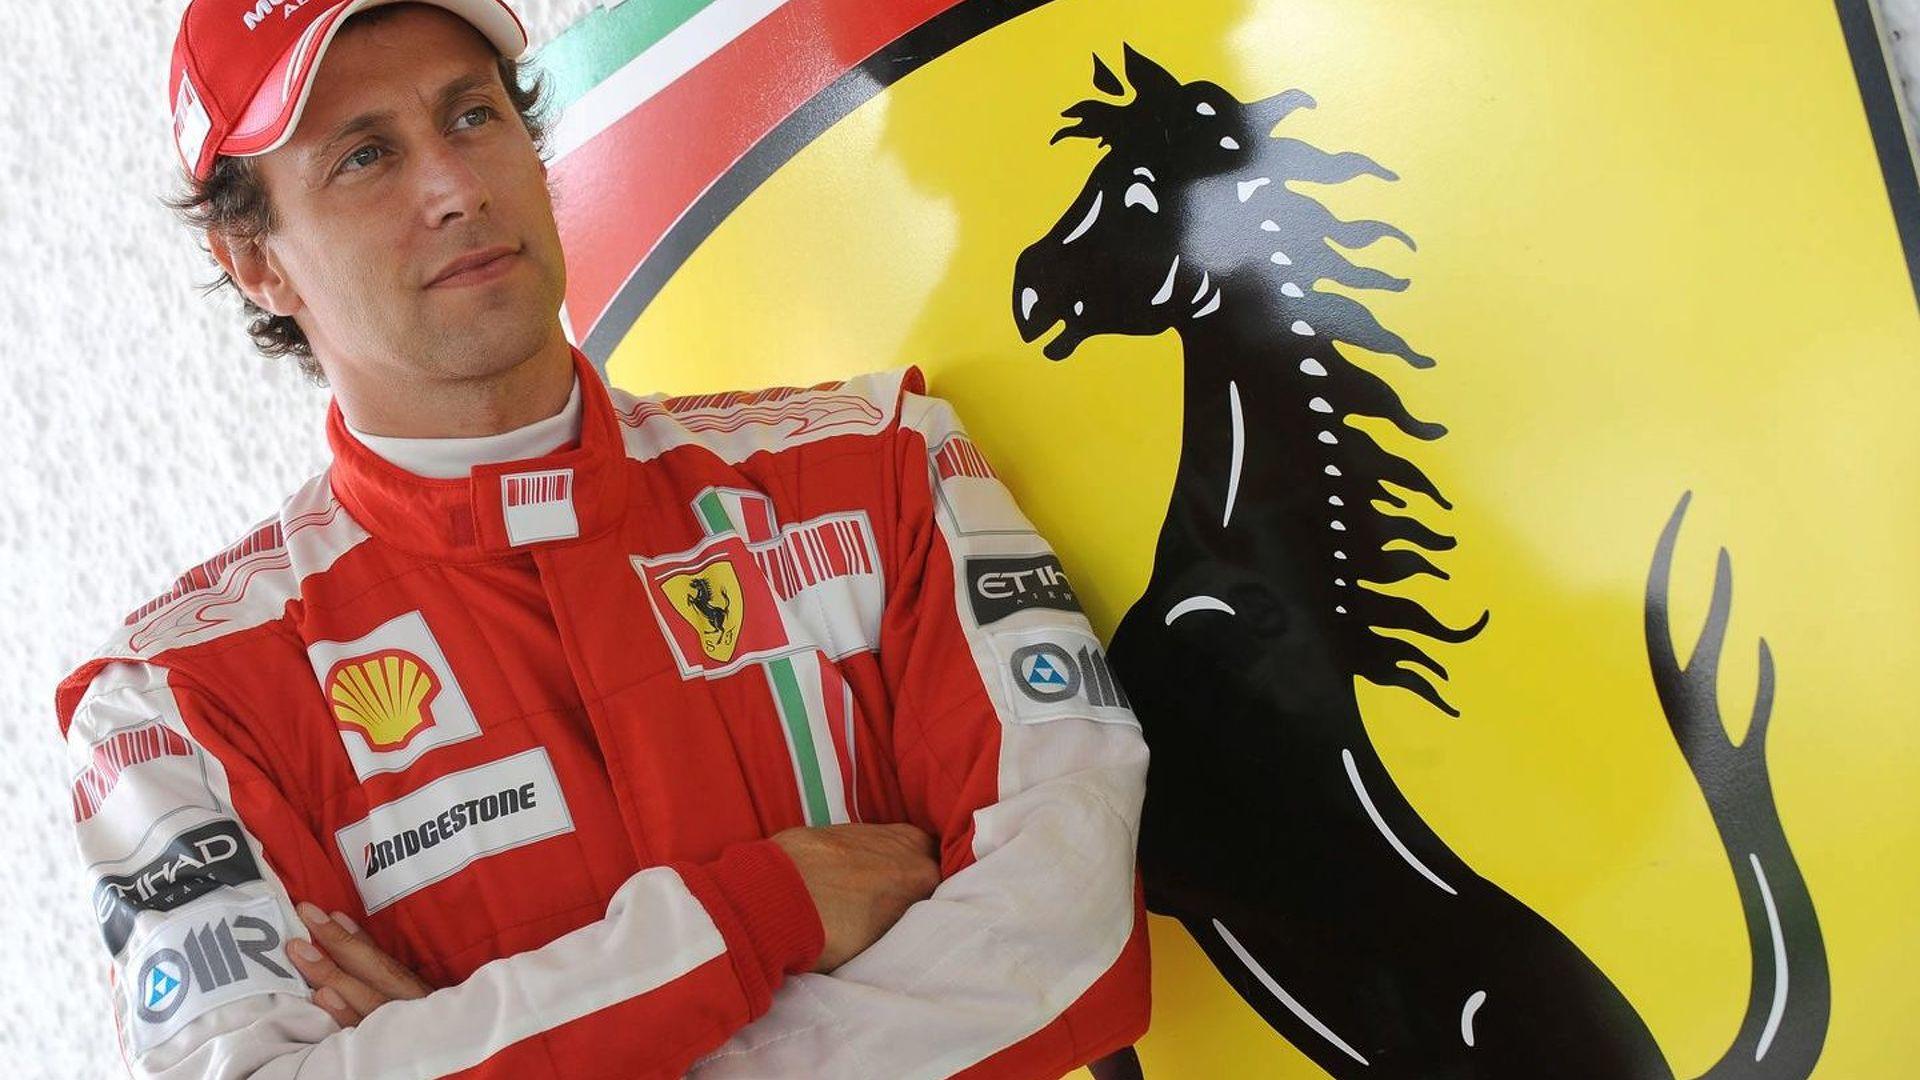 Test driver Badoer leaving Ferrari - report